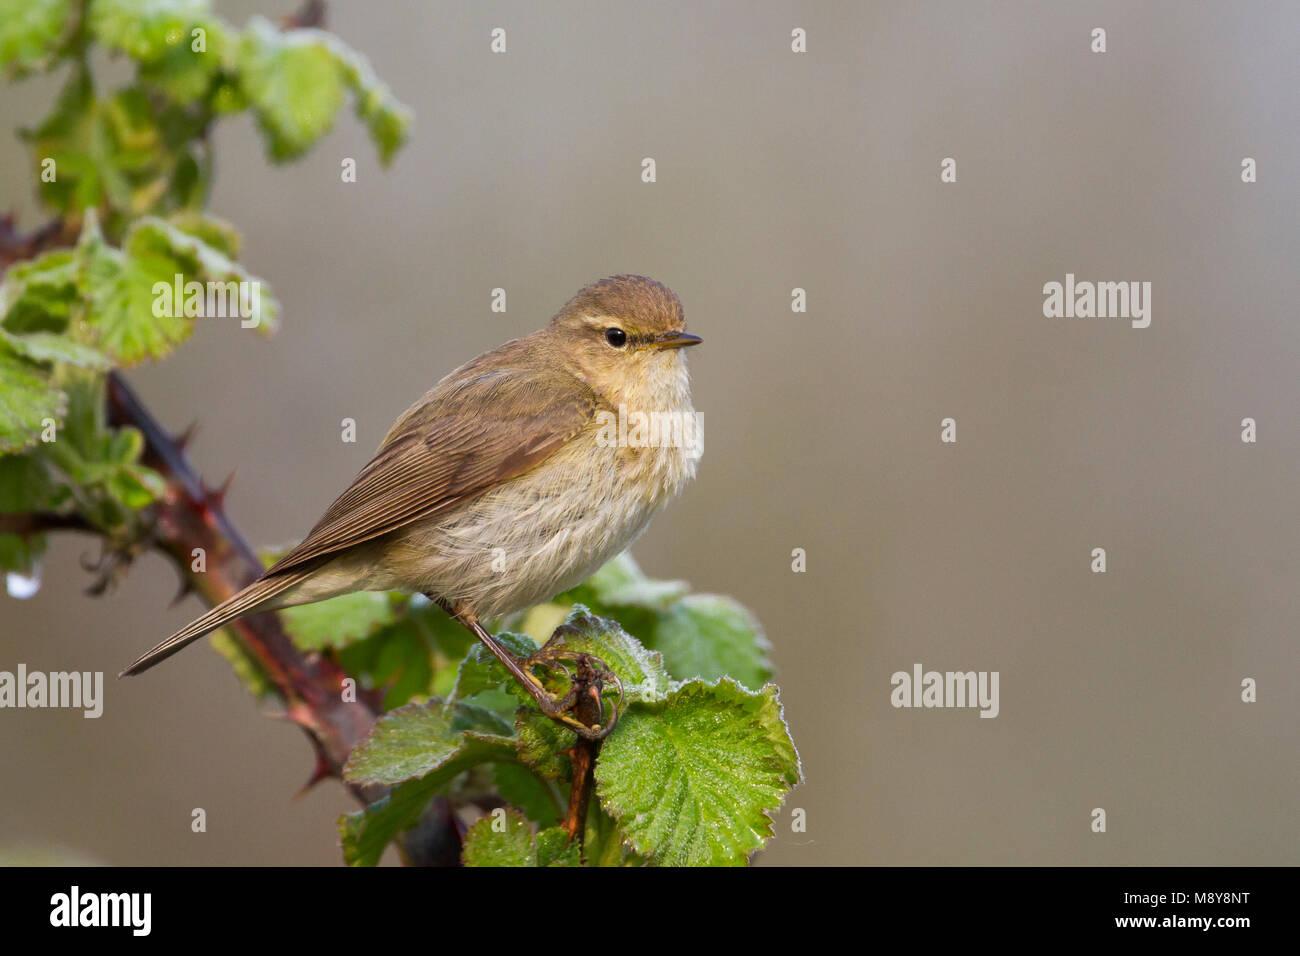 Common Chiffchaff - Zilpzalp - Phylloscopus collybita ssp. collybita, Germany Stock Photo